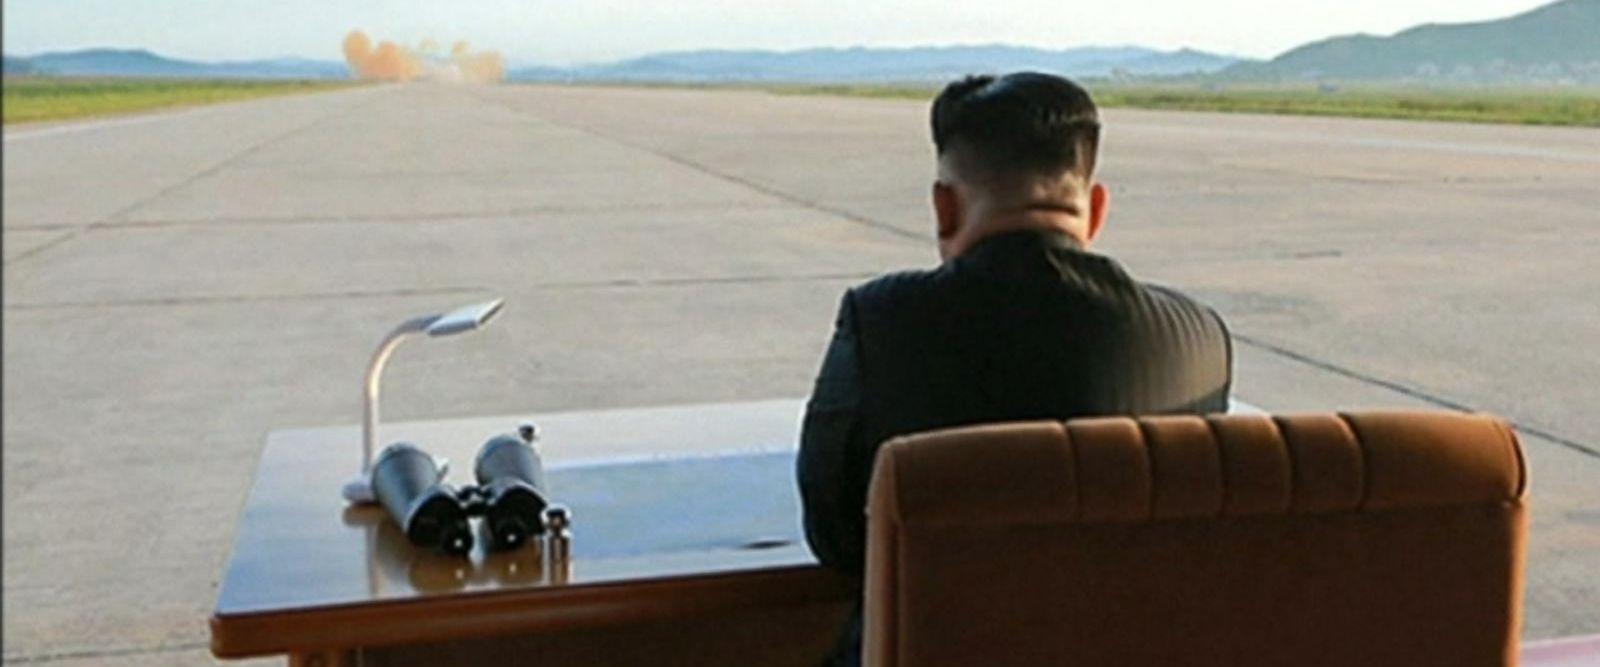 VIDEO: North Korea issues threat amid summit jitters